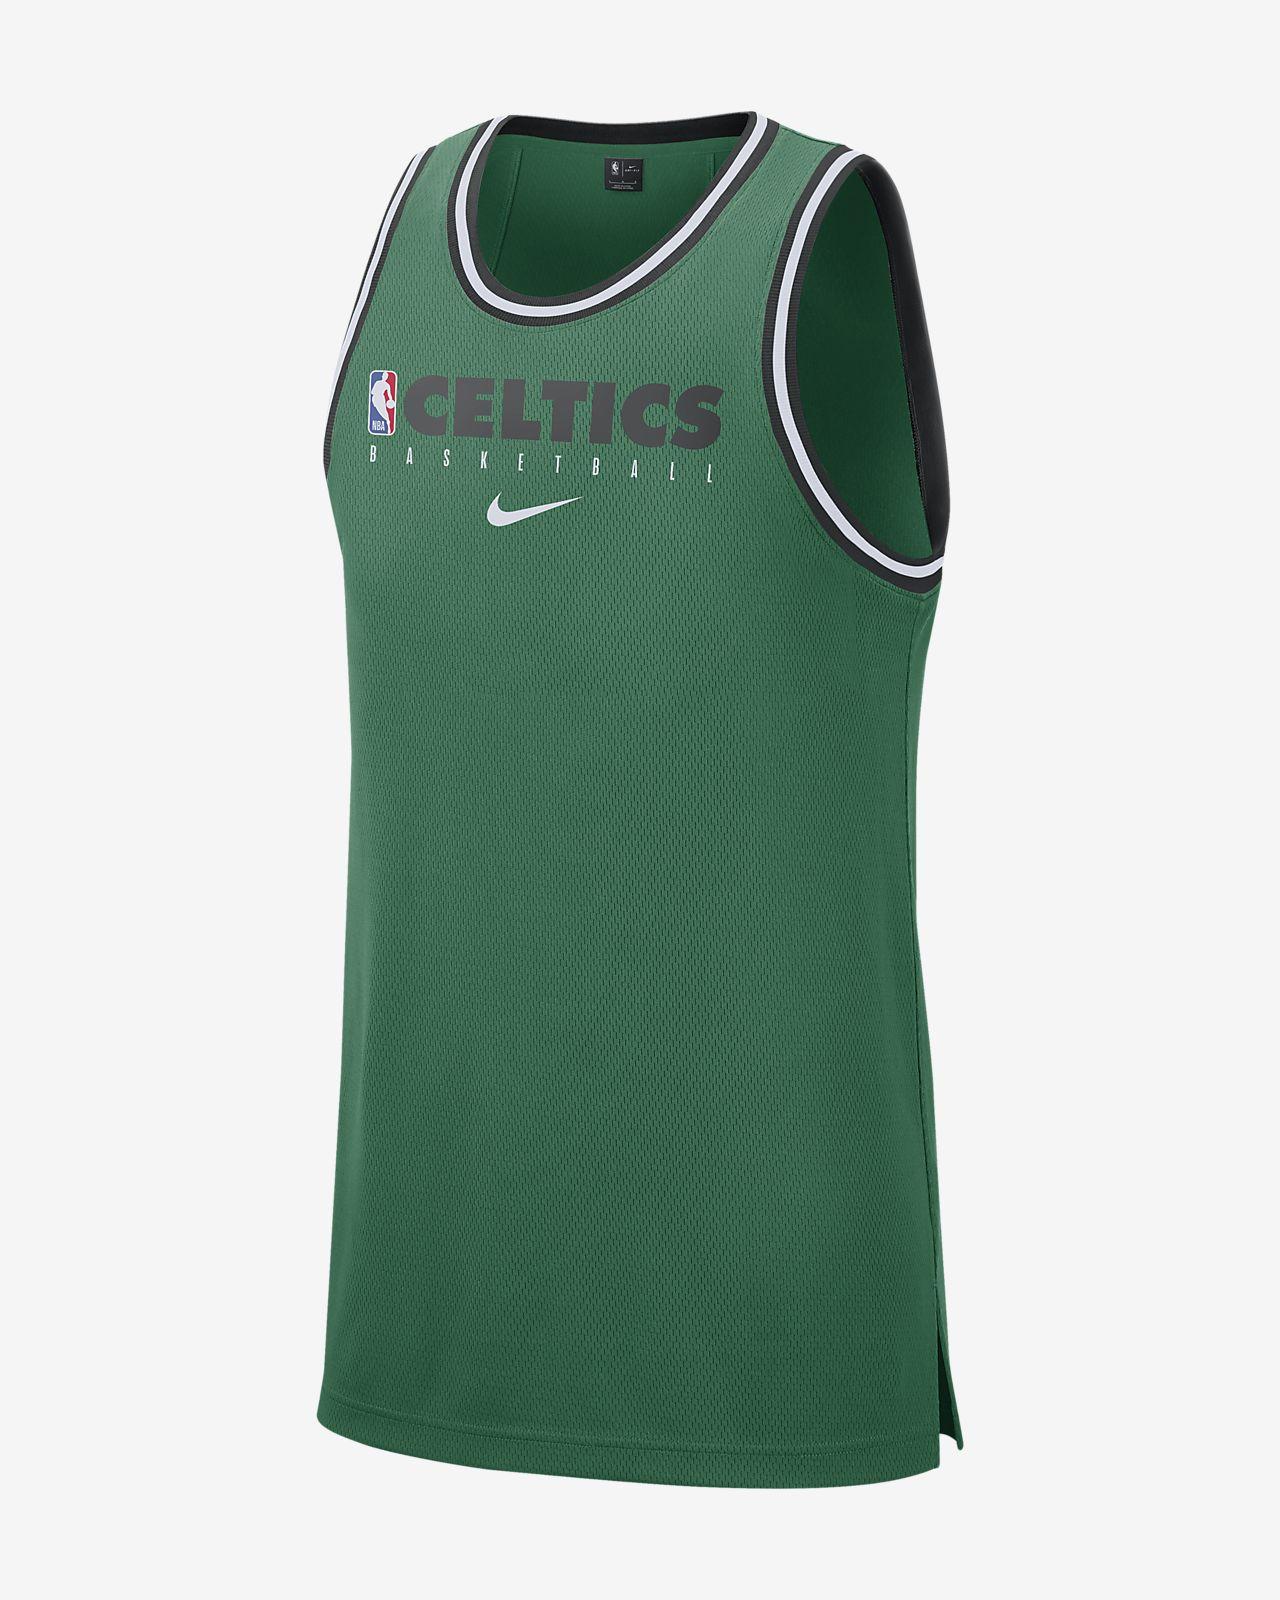 NBA-linne Boston Celtics Nike Dri-FIT för män